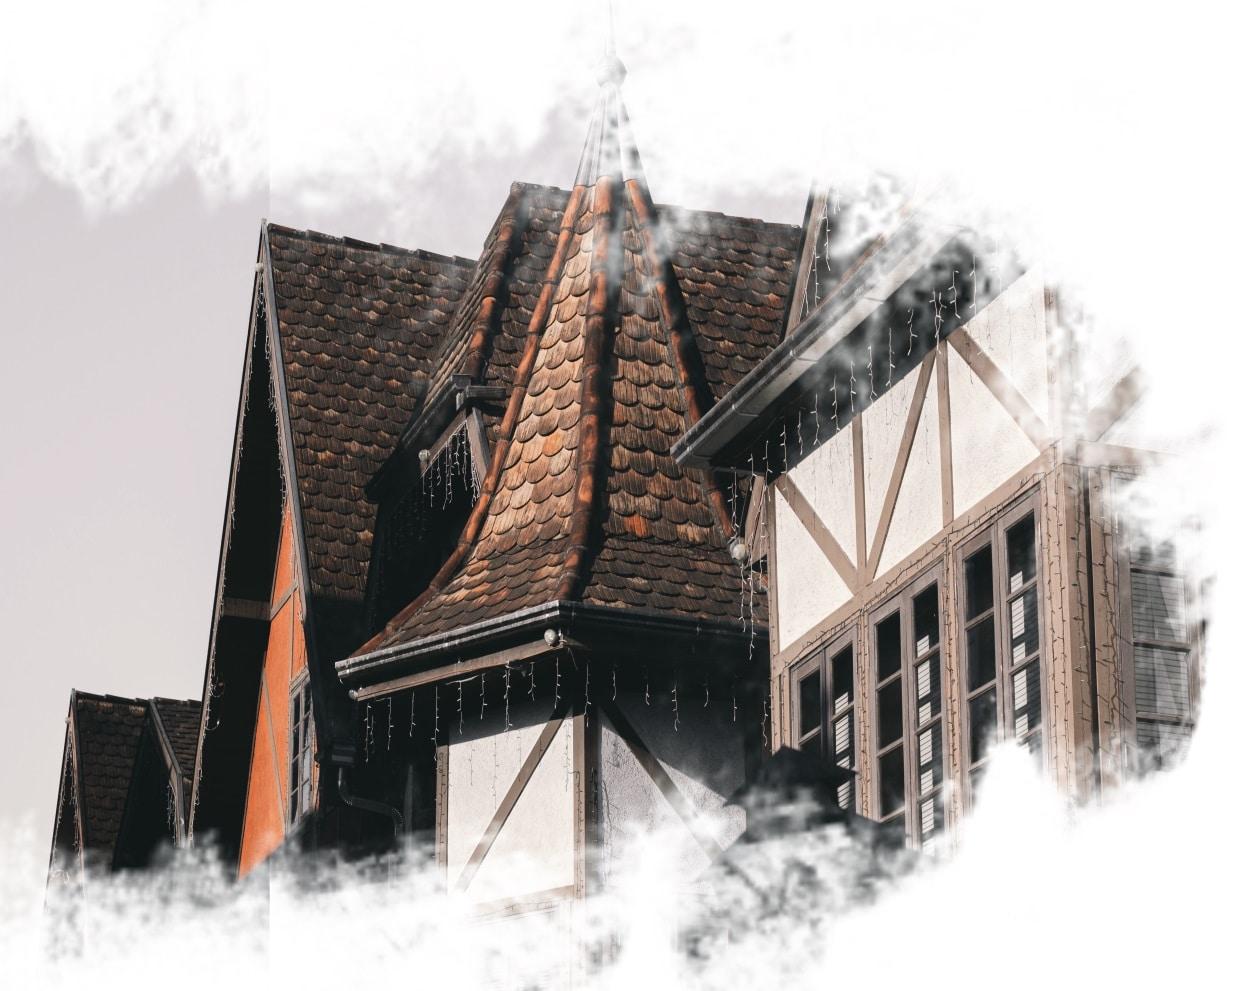 Arquitetura einxamel em Blumenau.